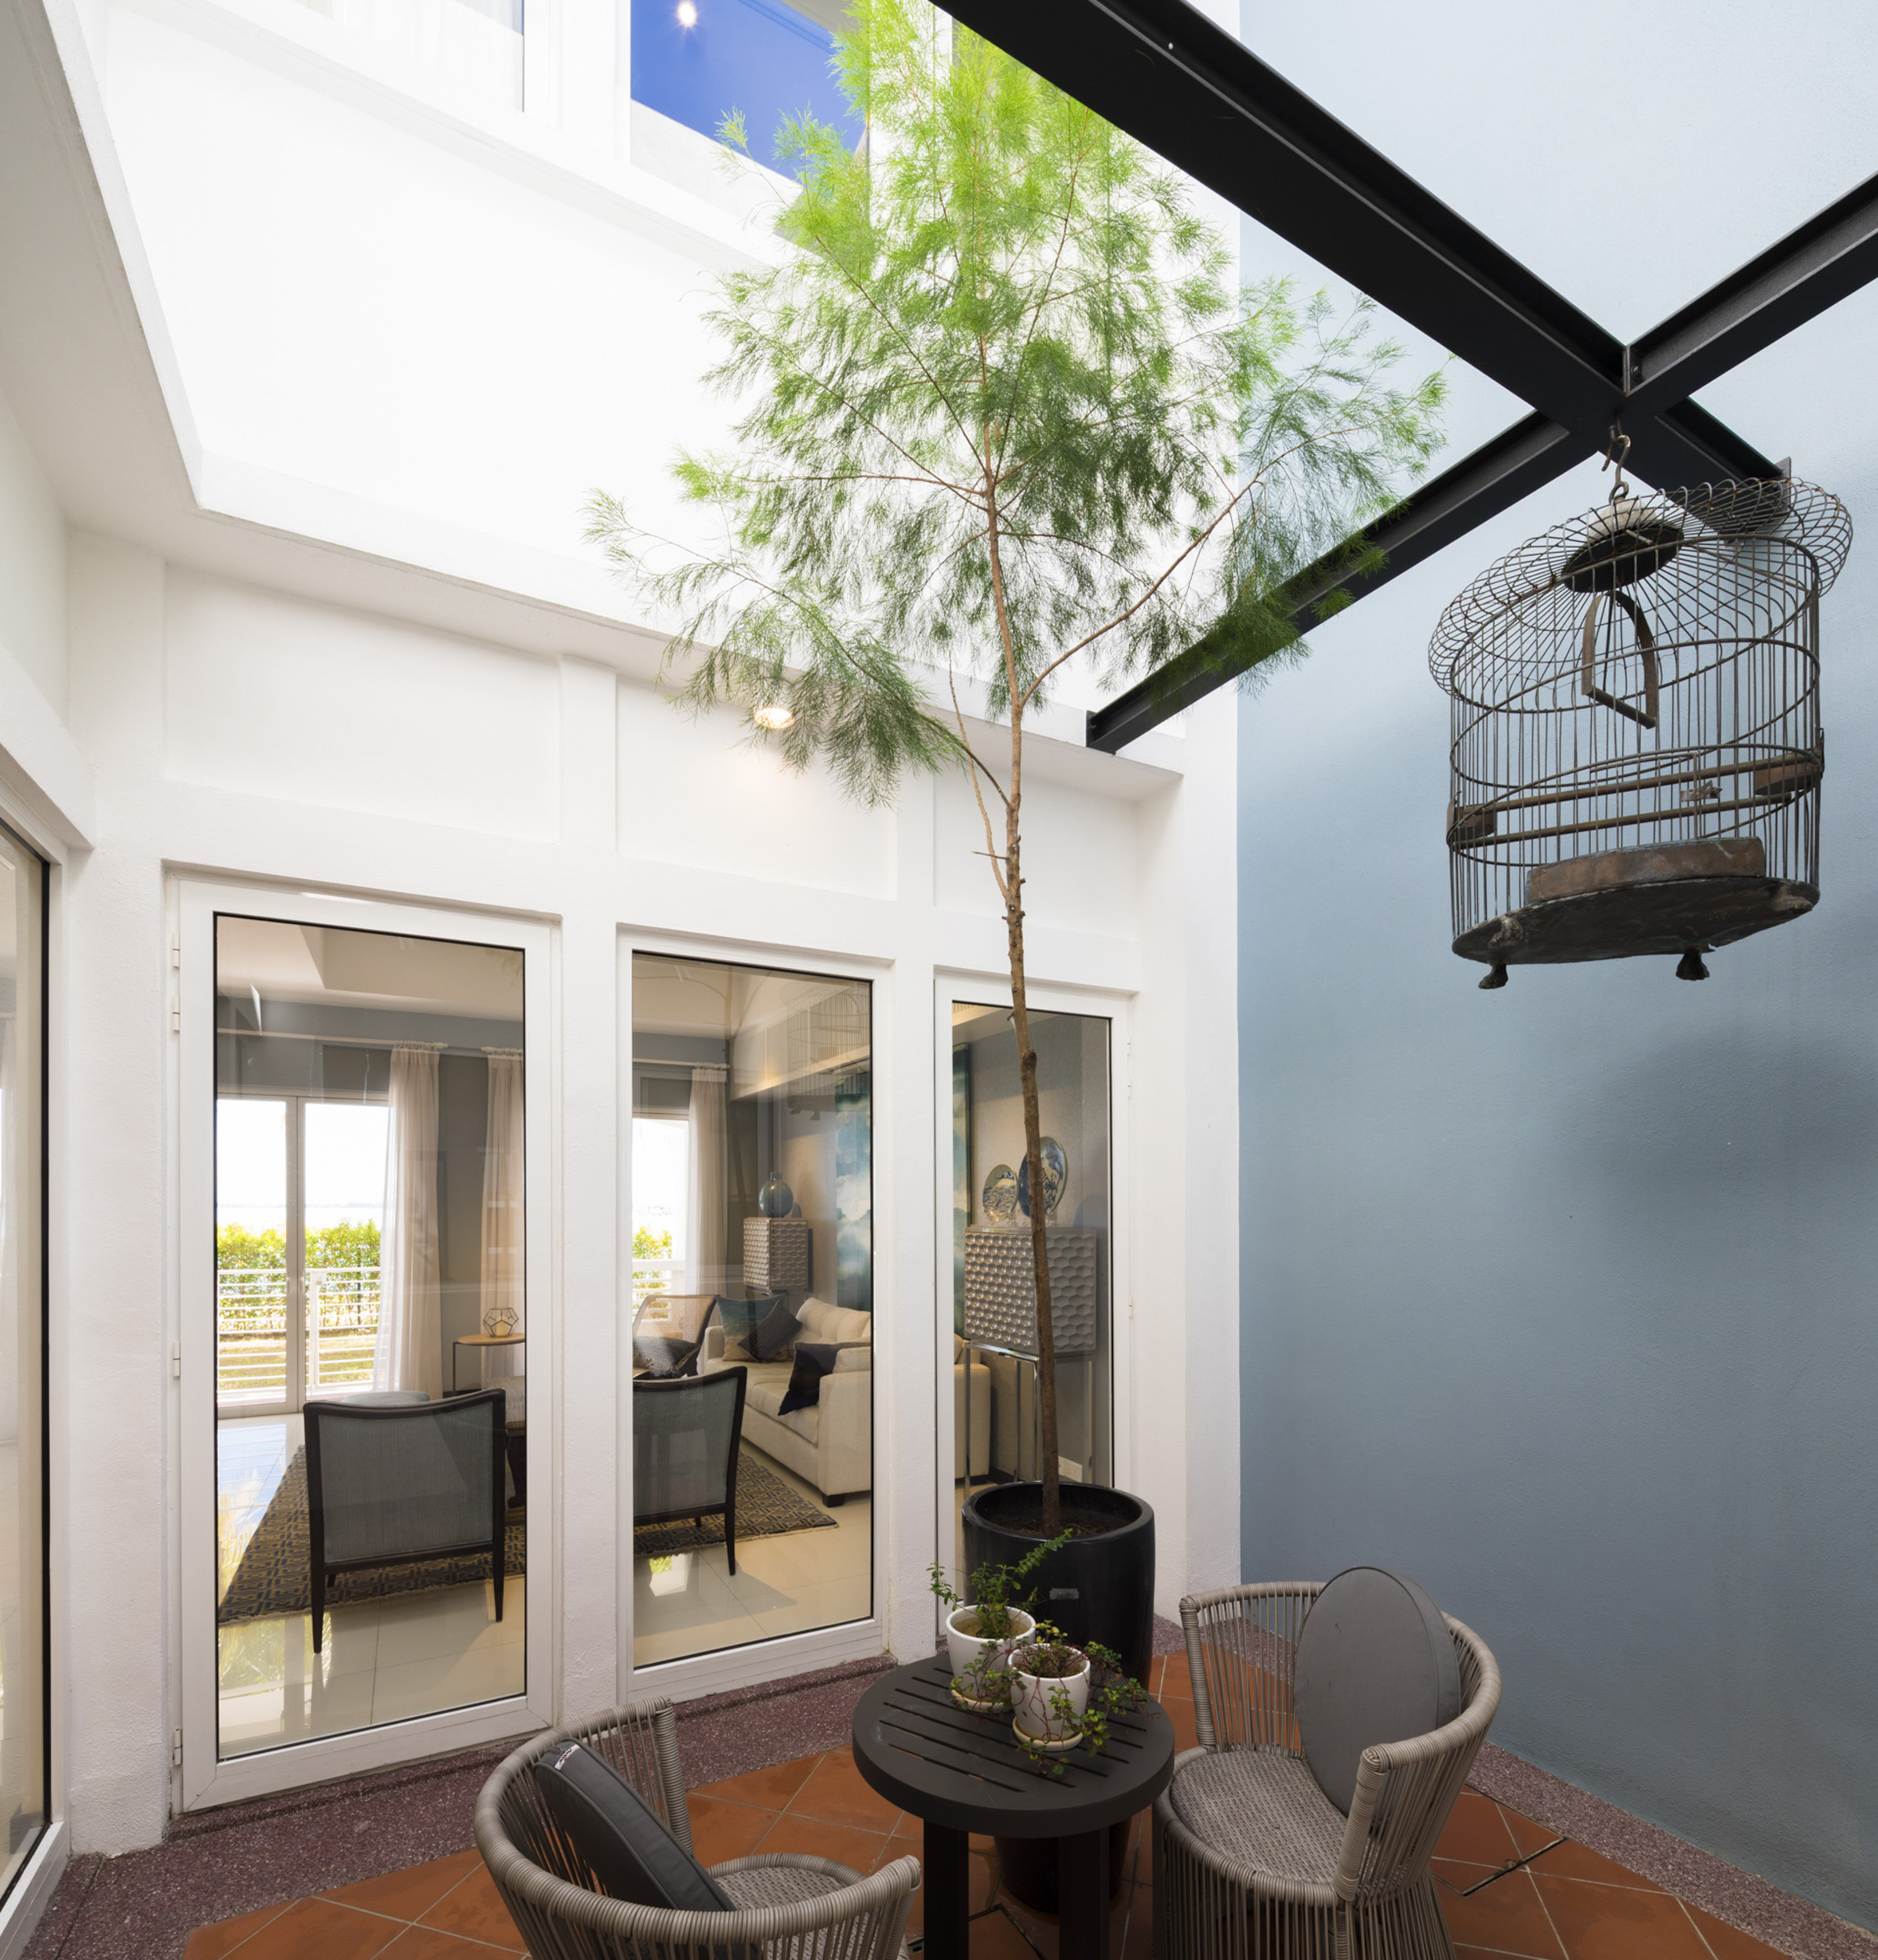 architecture_photography_sydney_australia_83.jpg